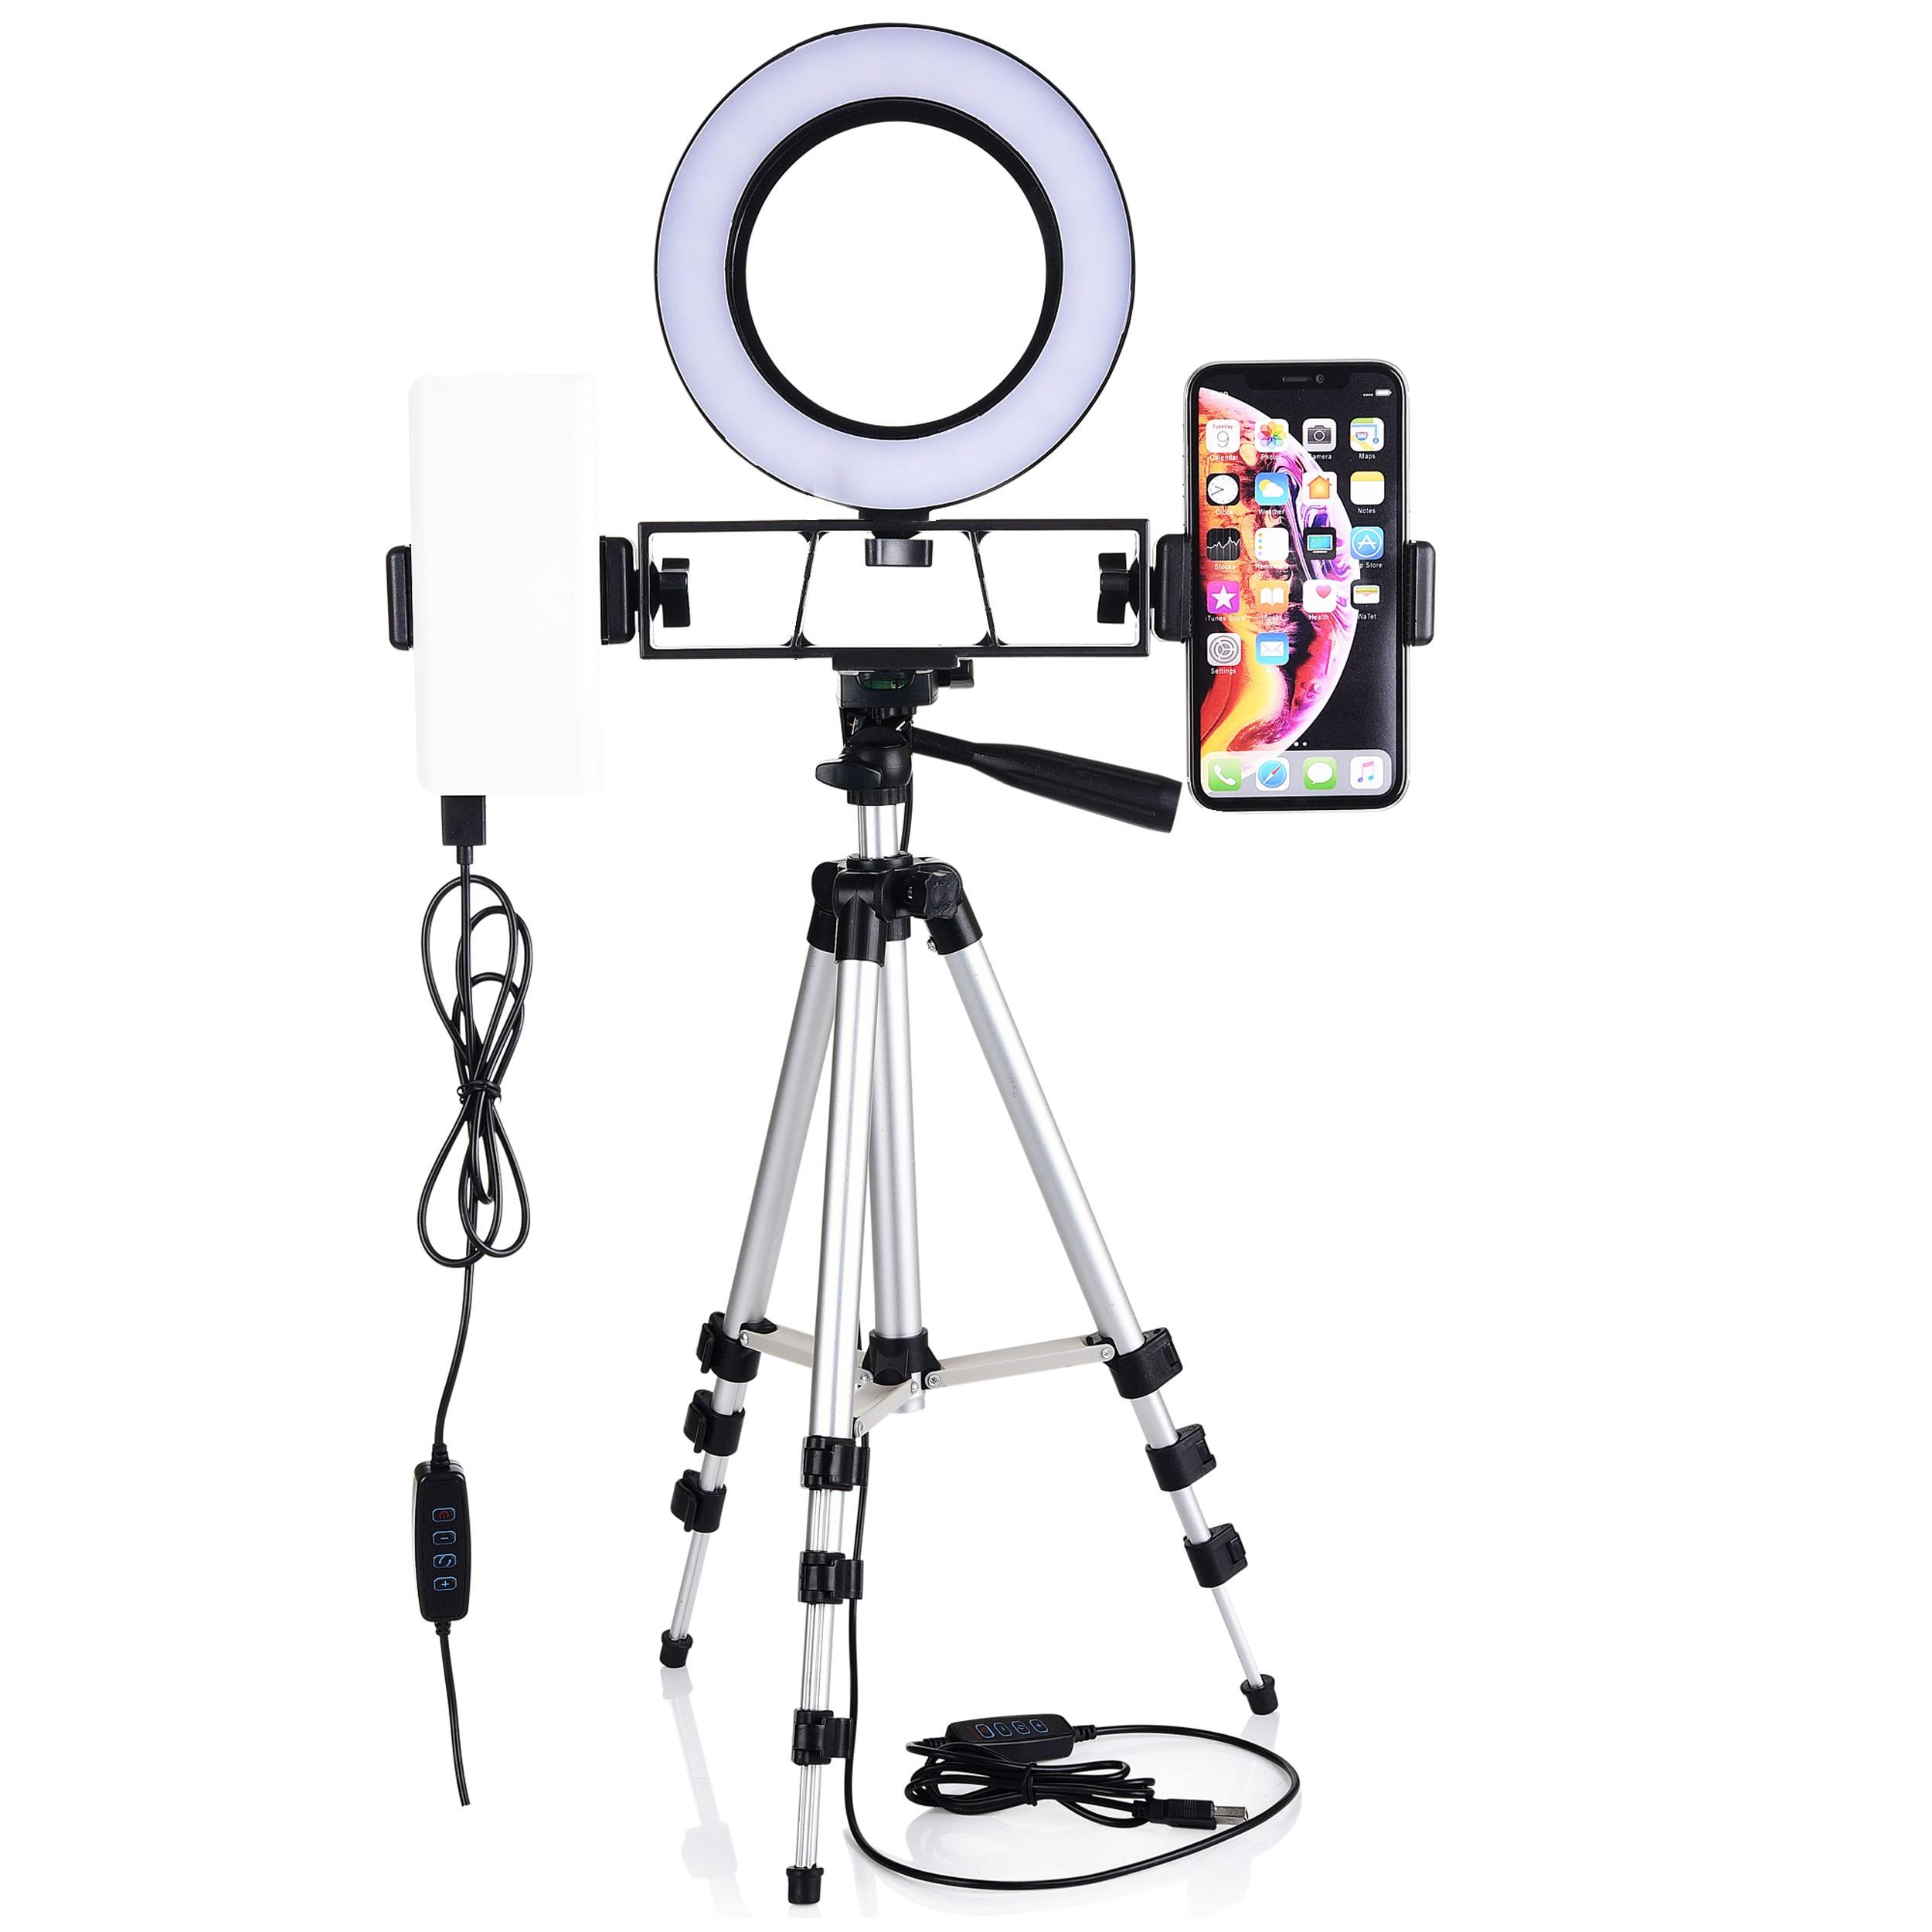 Ring Light Kit Cell Phone Holder Desktop LED Lamp 3 Light Modes Brightness Level with Stand Camera Tripod for Video